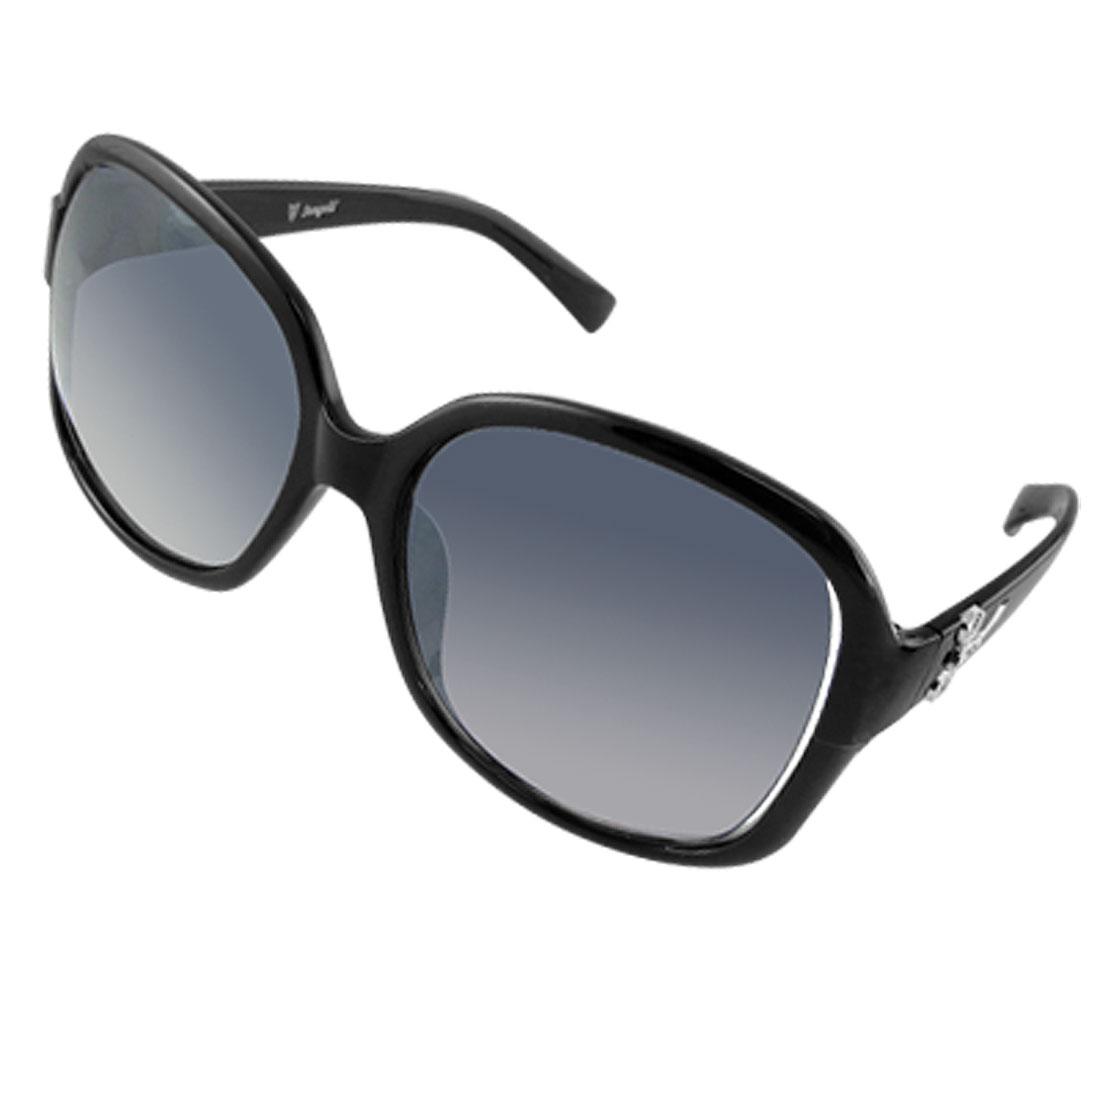 UV Protection Black Plastic Full-Rim Oversize Lens Lady Sunglasses